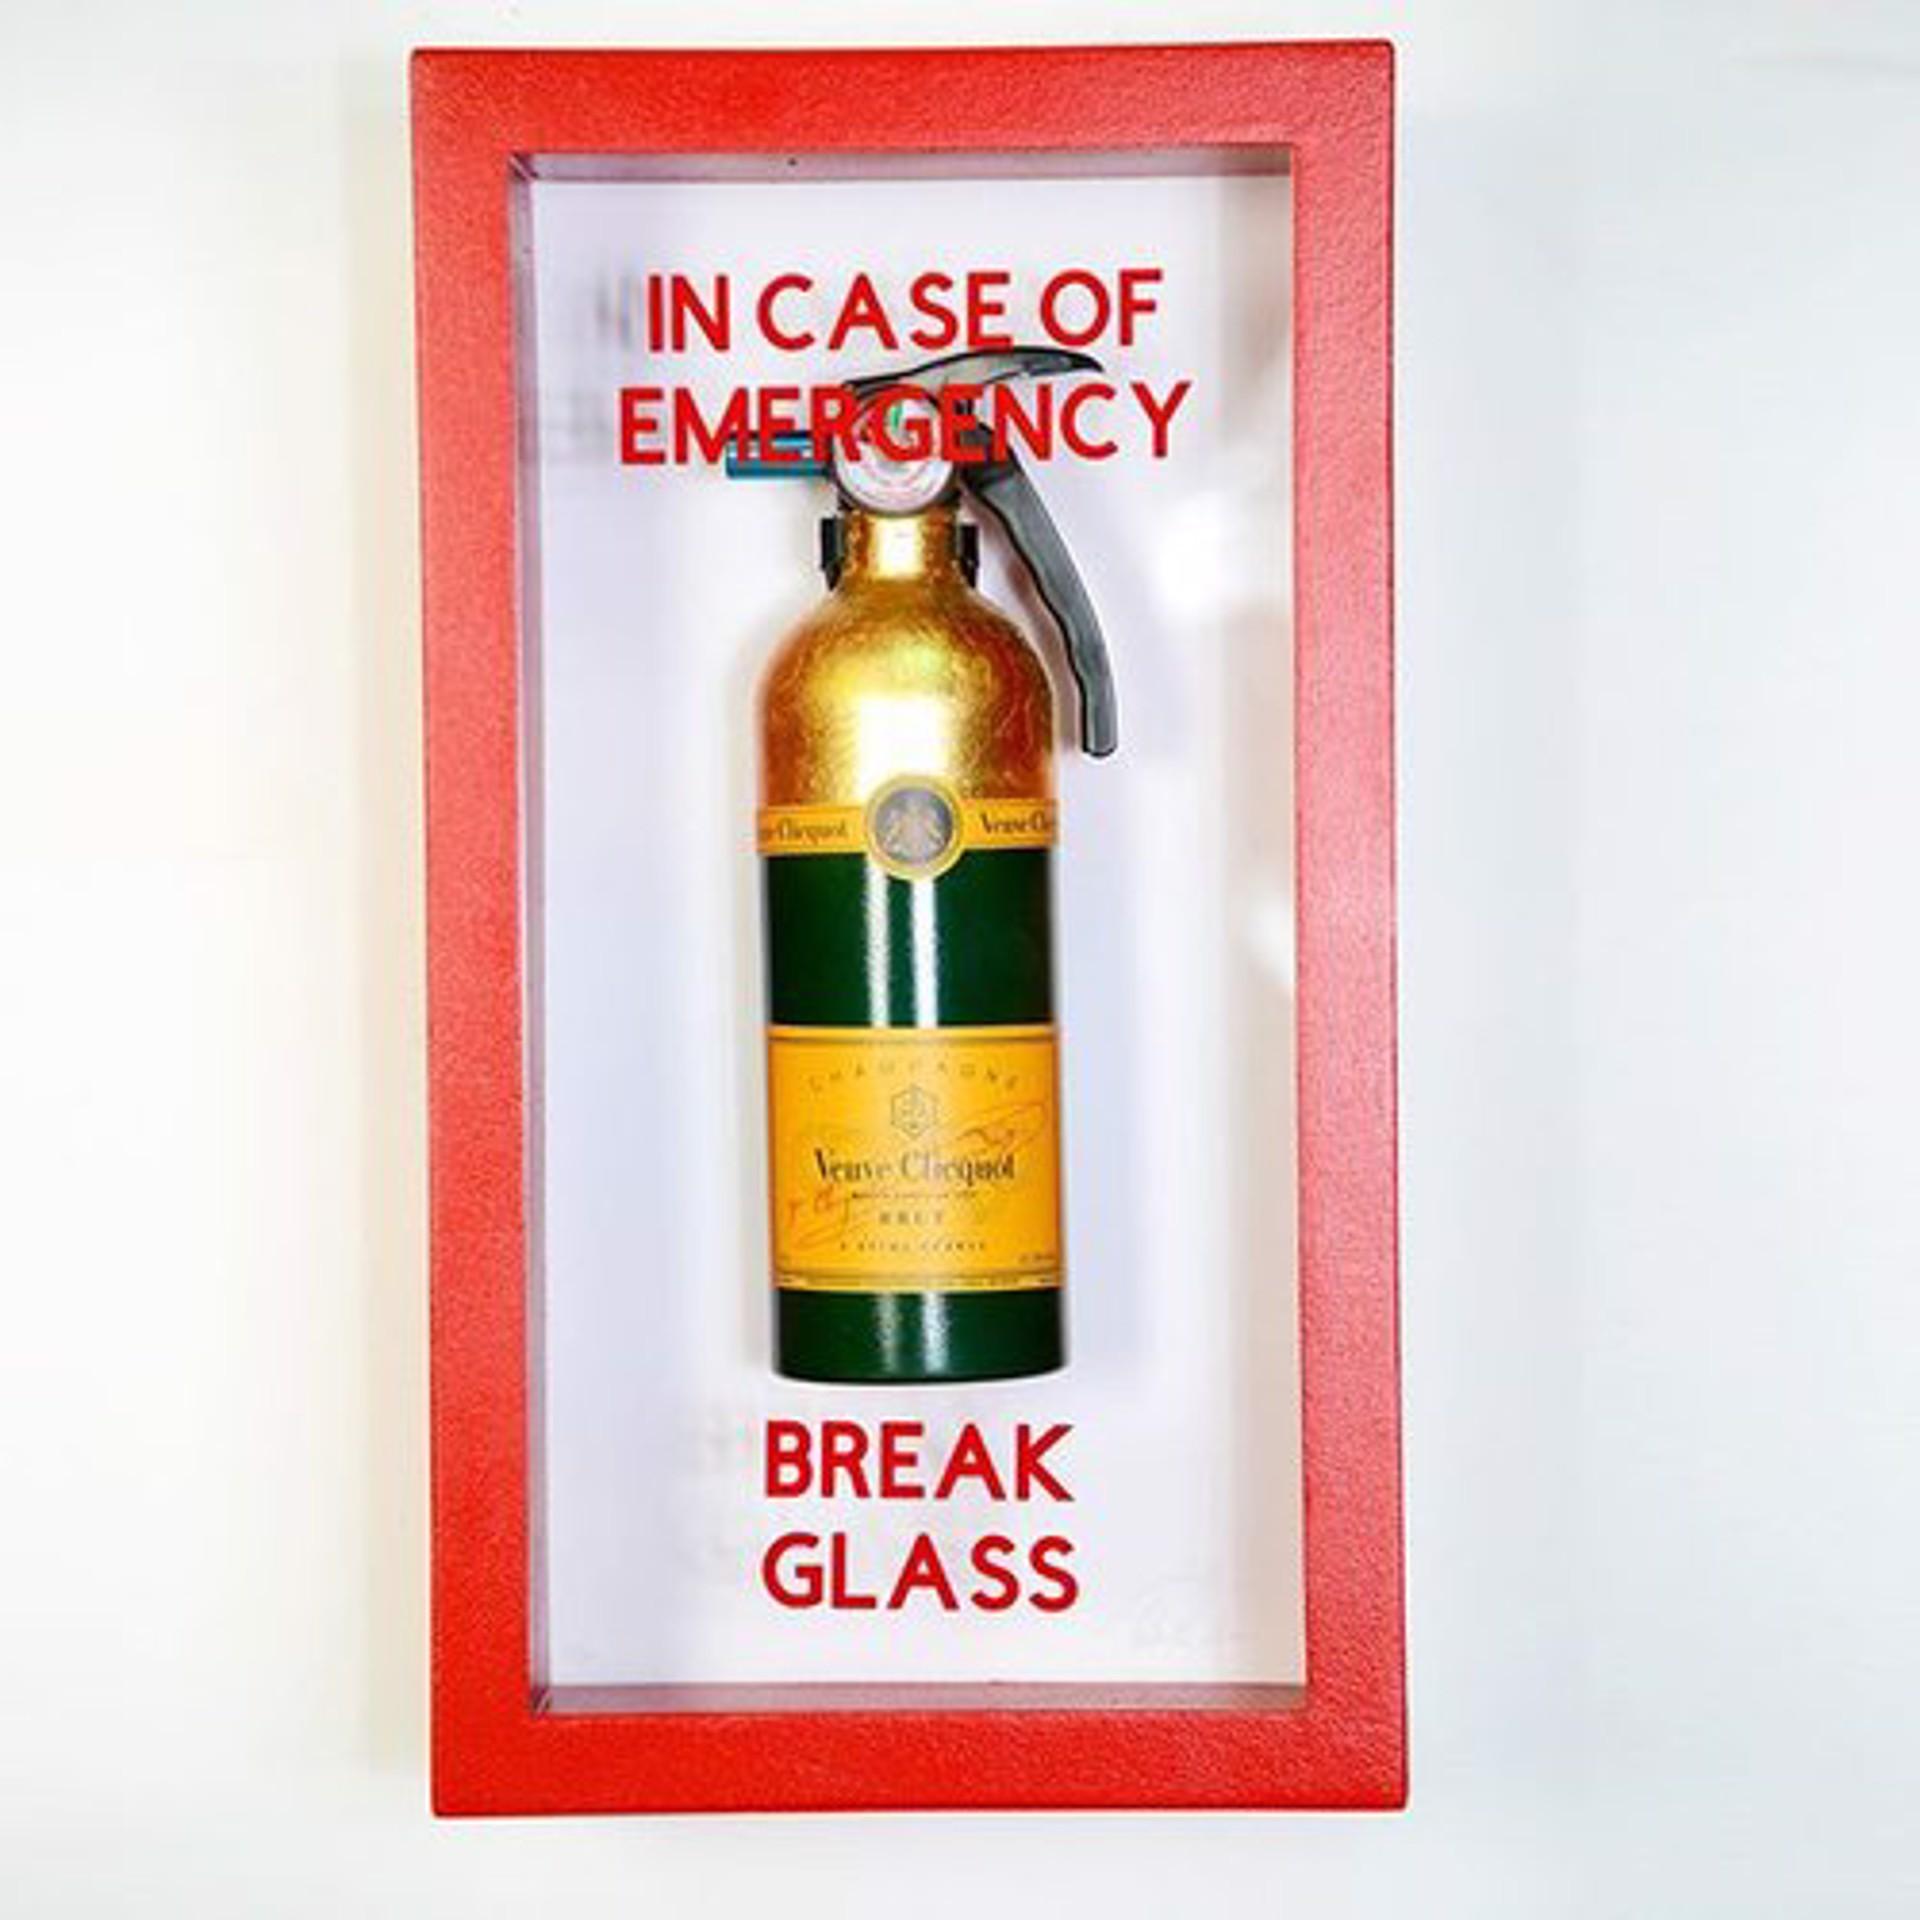 In Case Of Emergency by Plastic Jesus